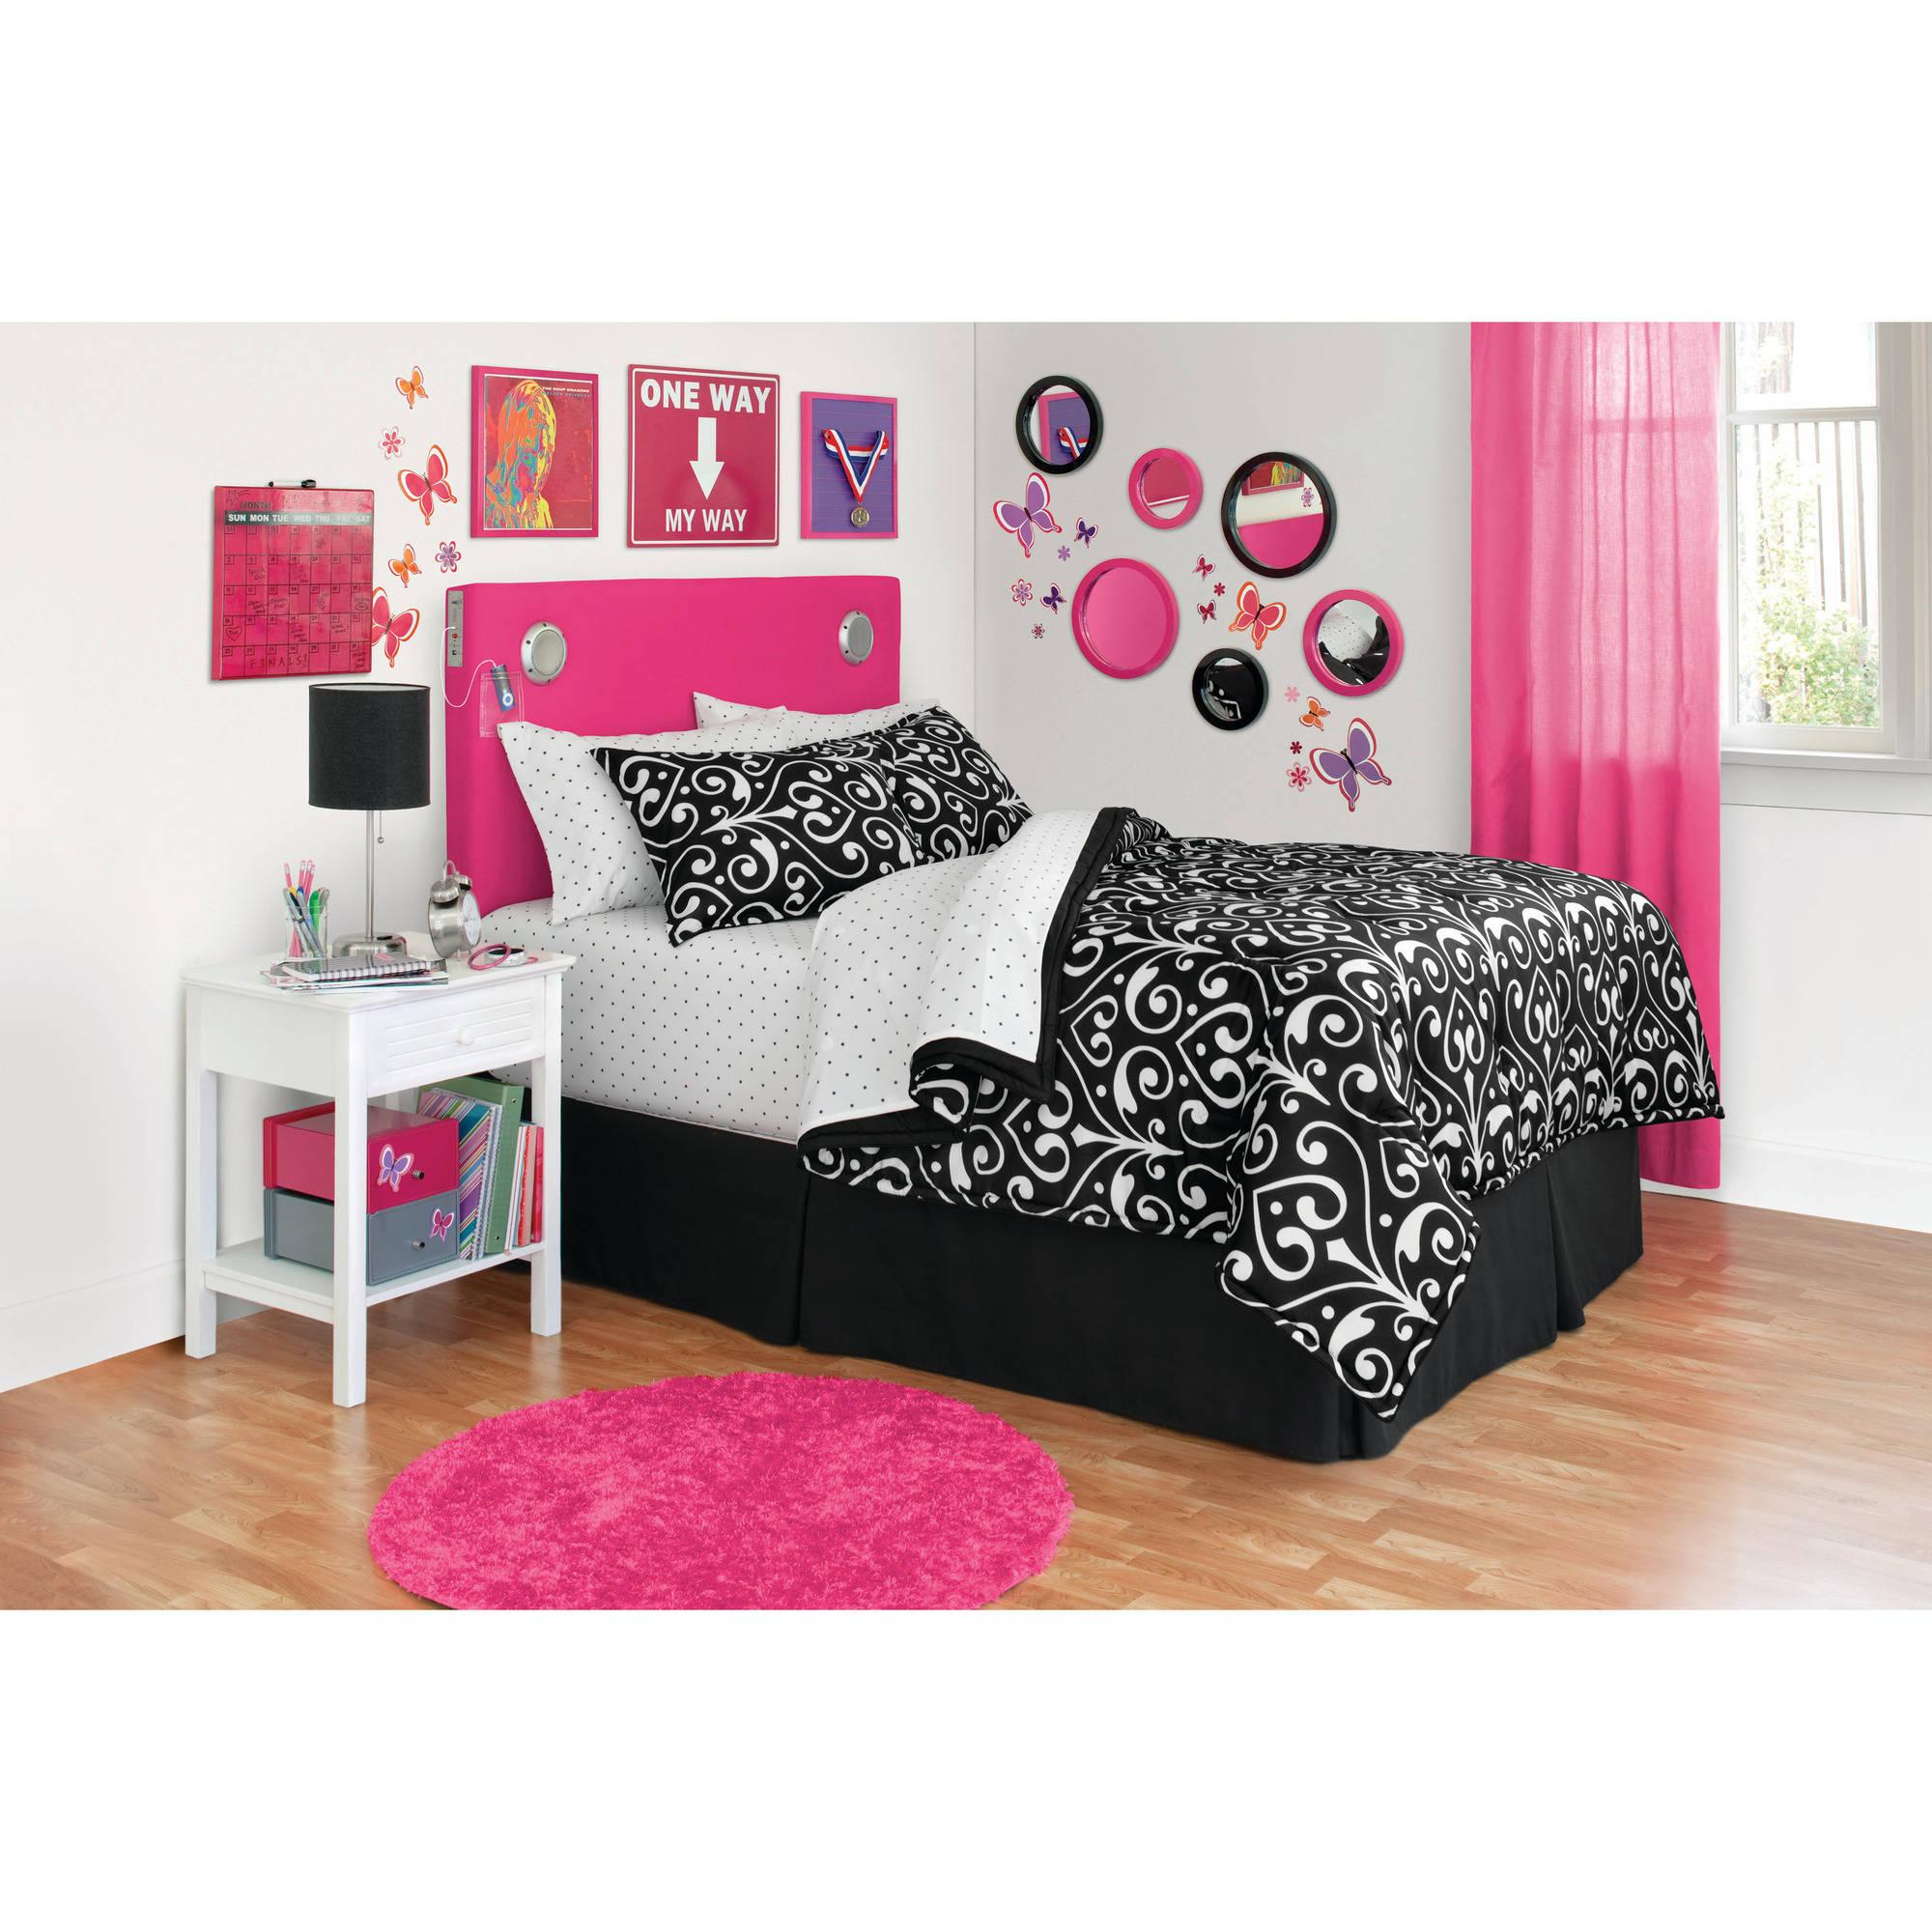 your zone reversible bedding set, dot damask/black and white dot